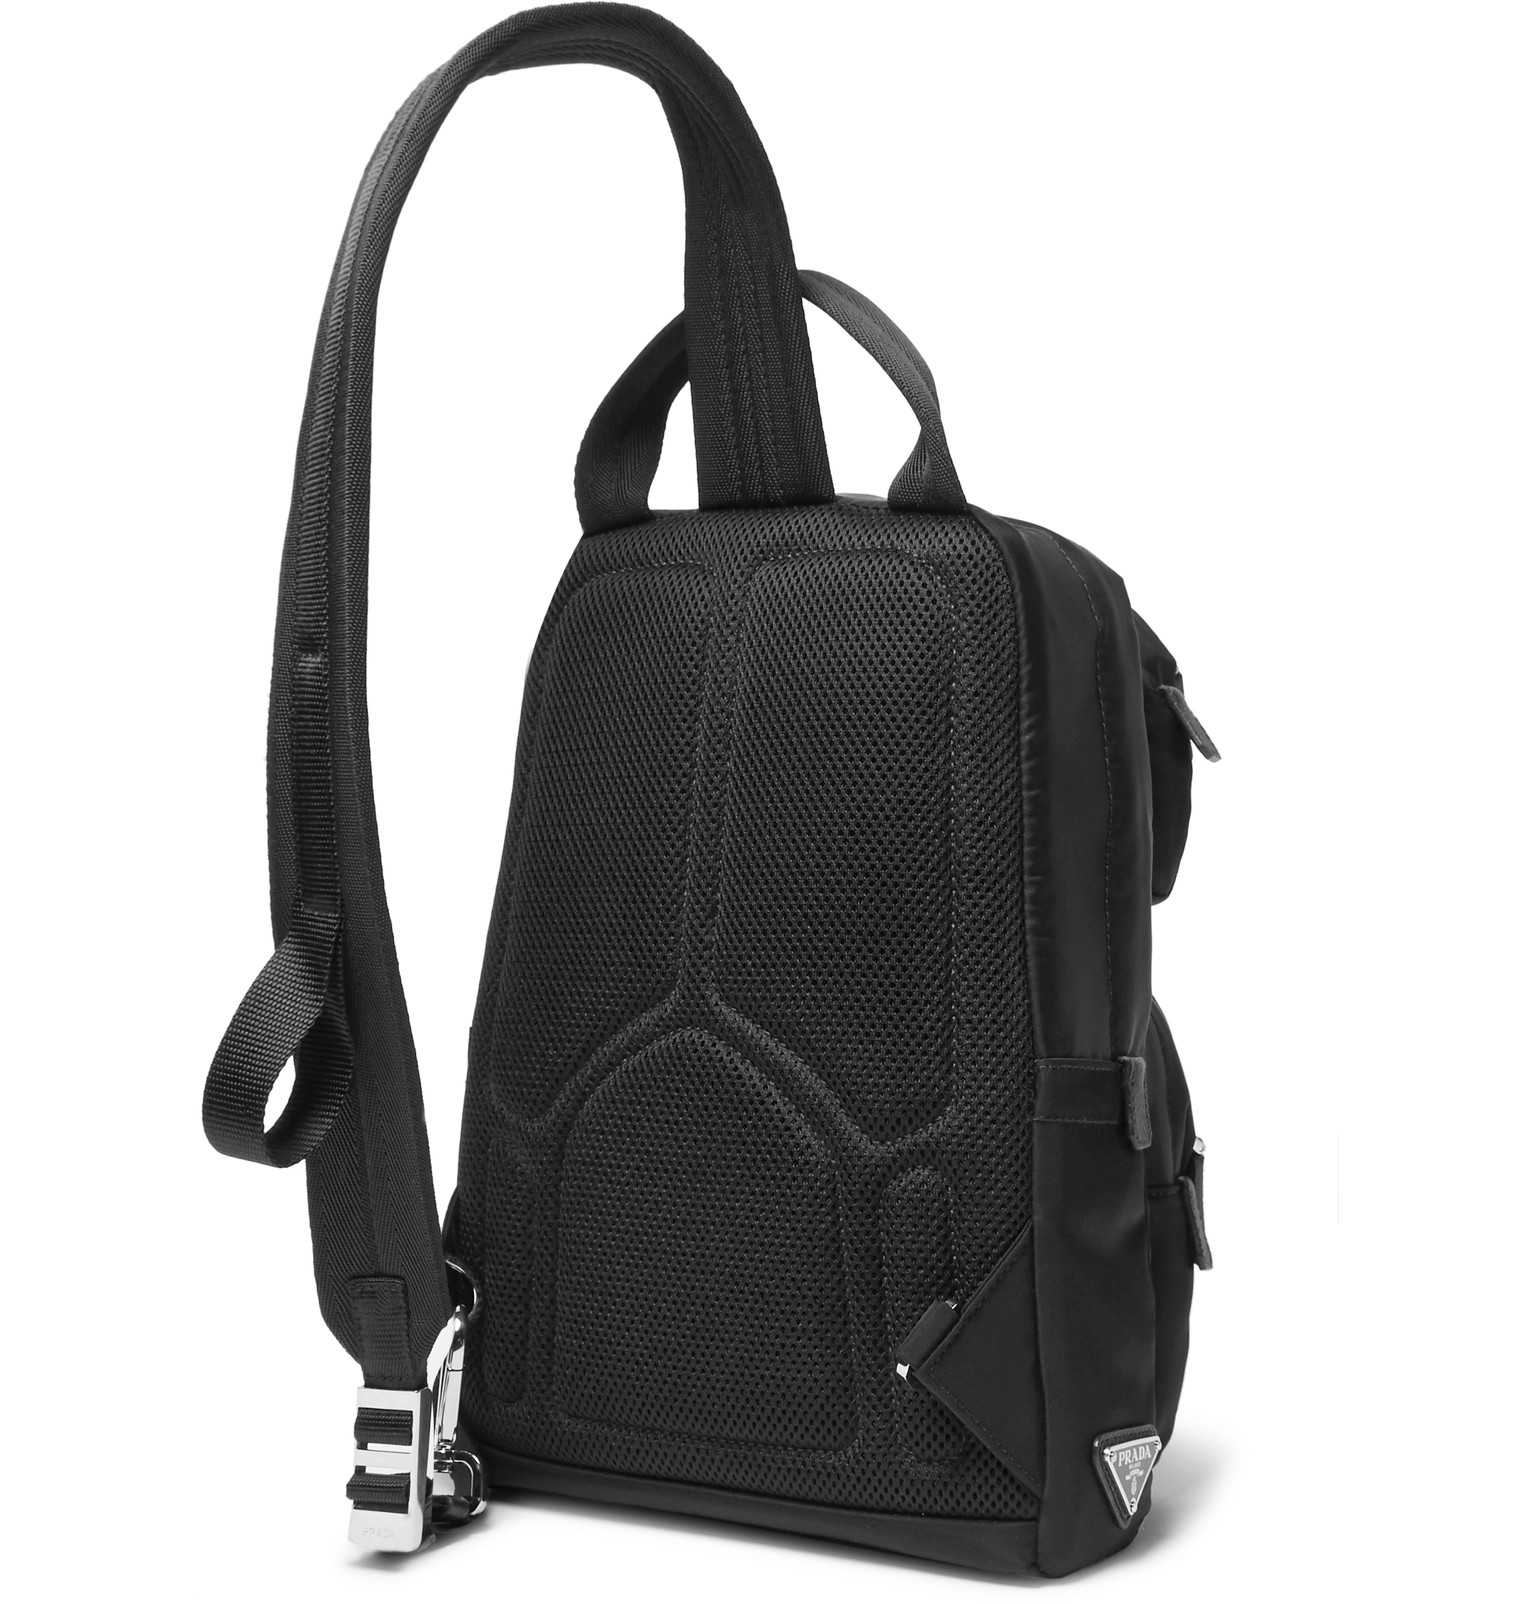 f7ef24f86000 Prada - Saffiano Leather-Trimmed Nylon Backpack